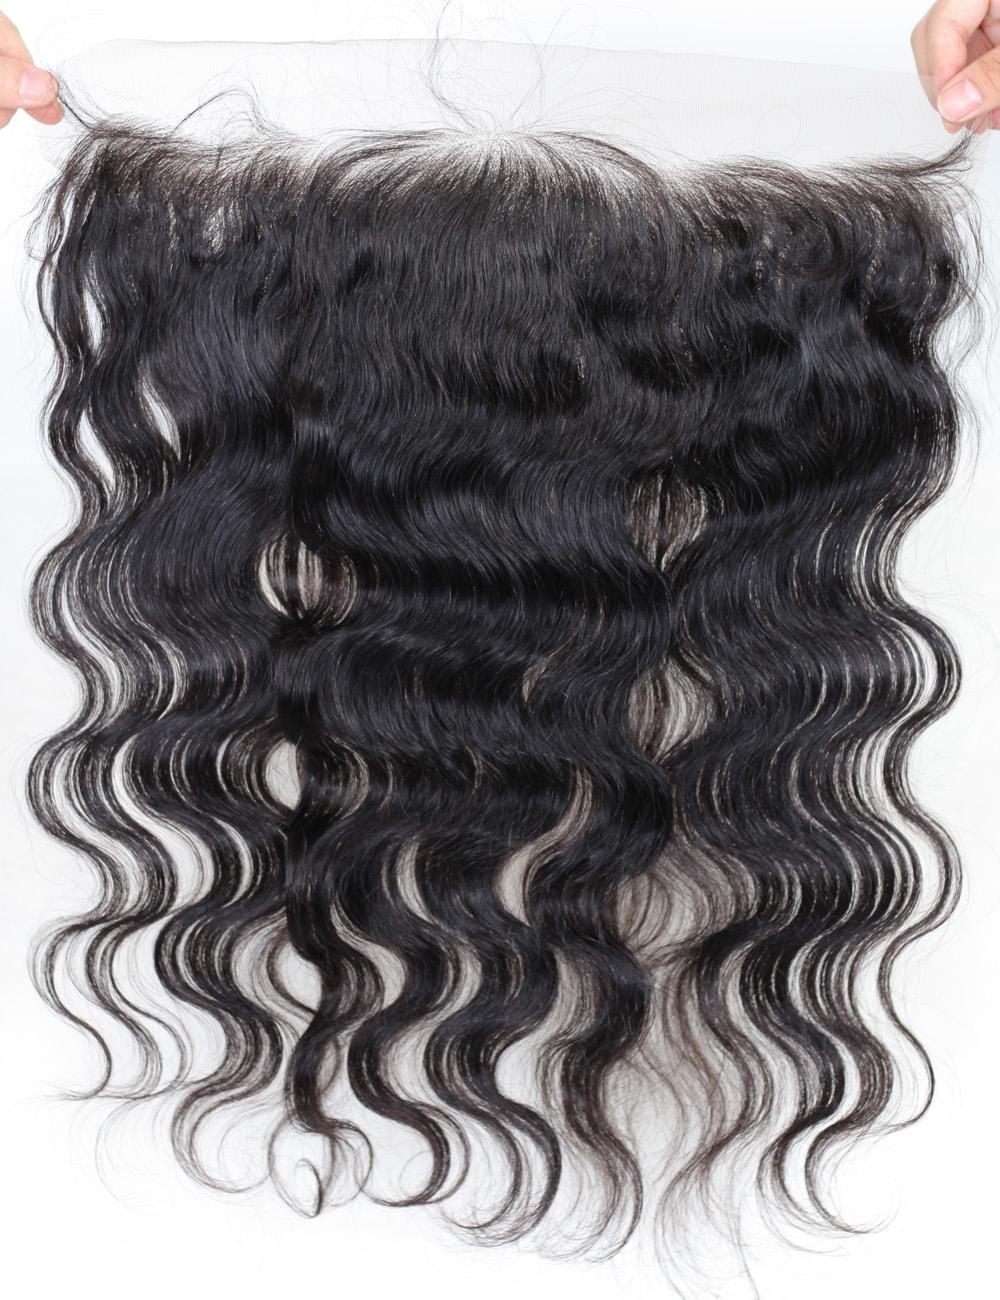 Virgin Human Hair Lace Frontal Wigs (1)